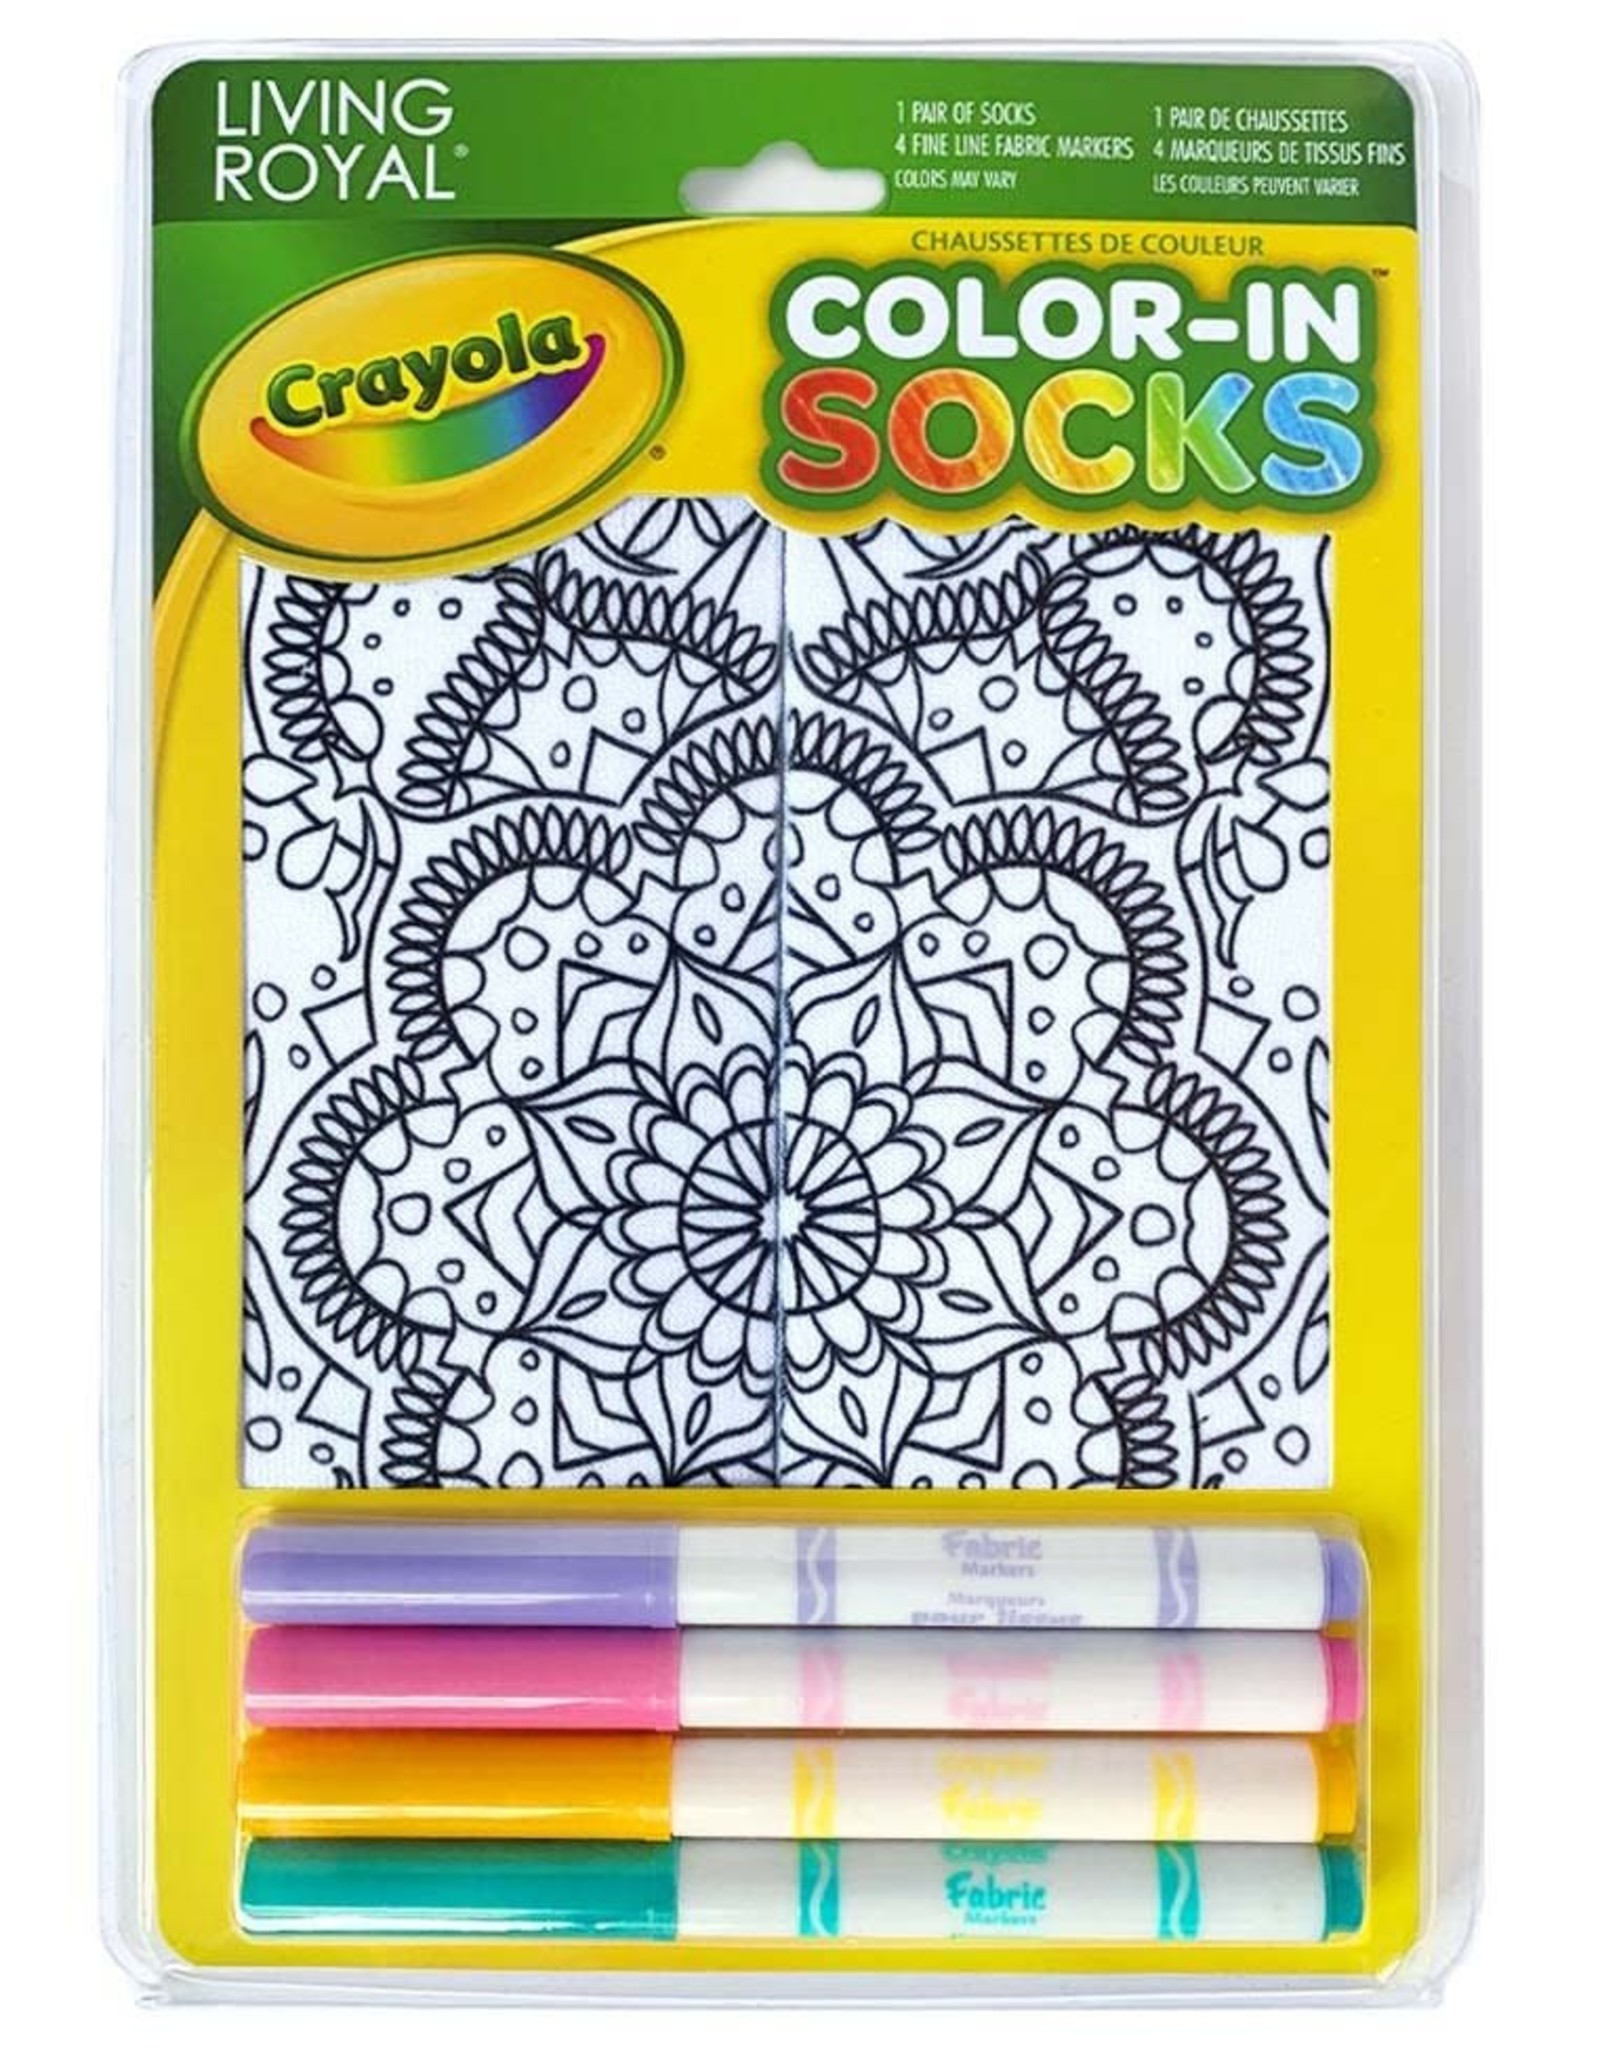 Crayola Color-In Socks: Mandala